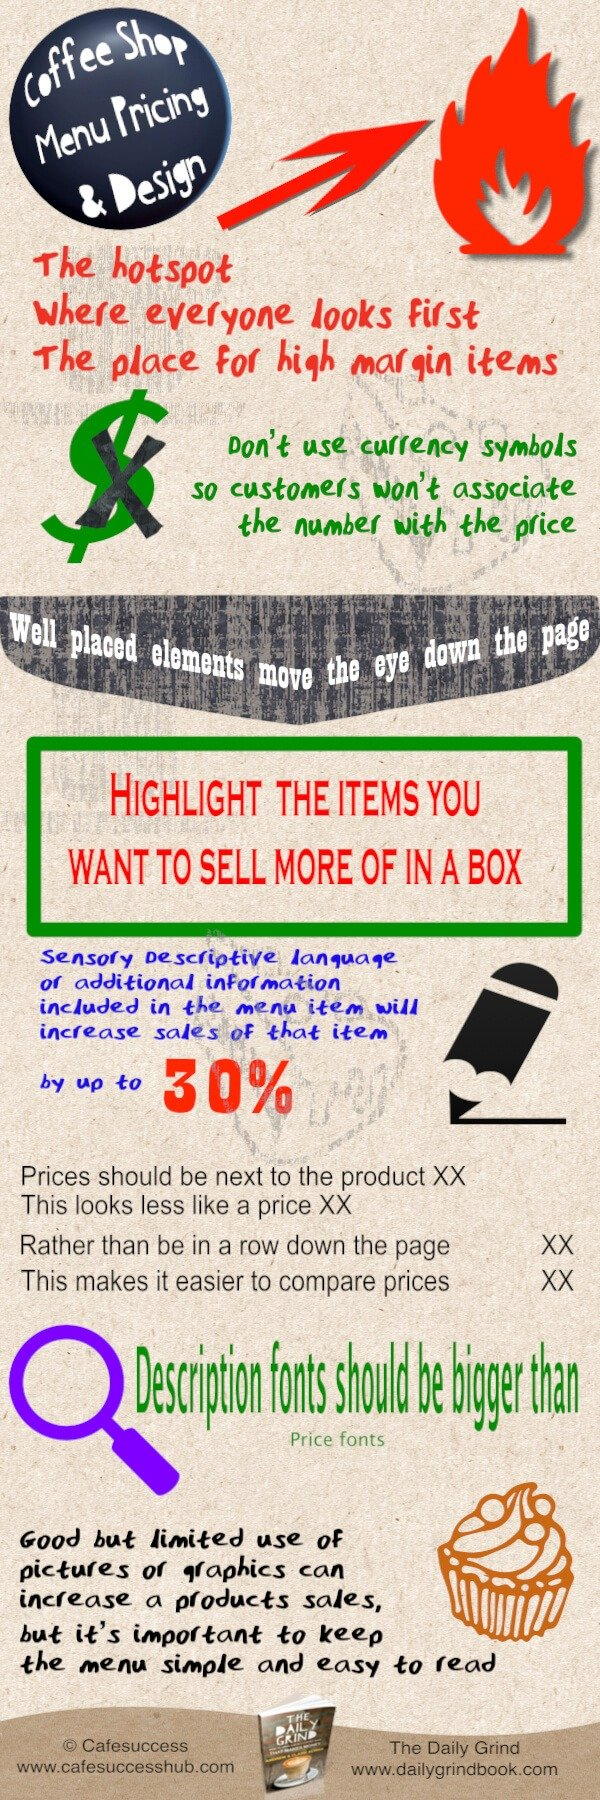 Coffee shop Menu Pricing Infographic